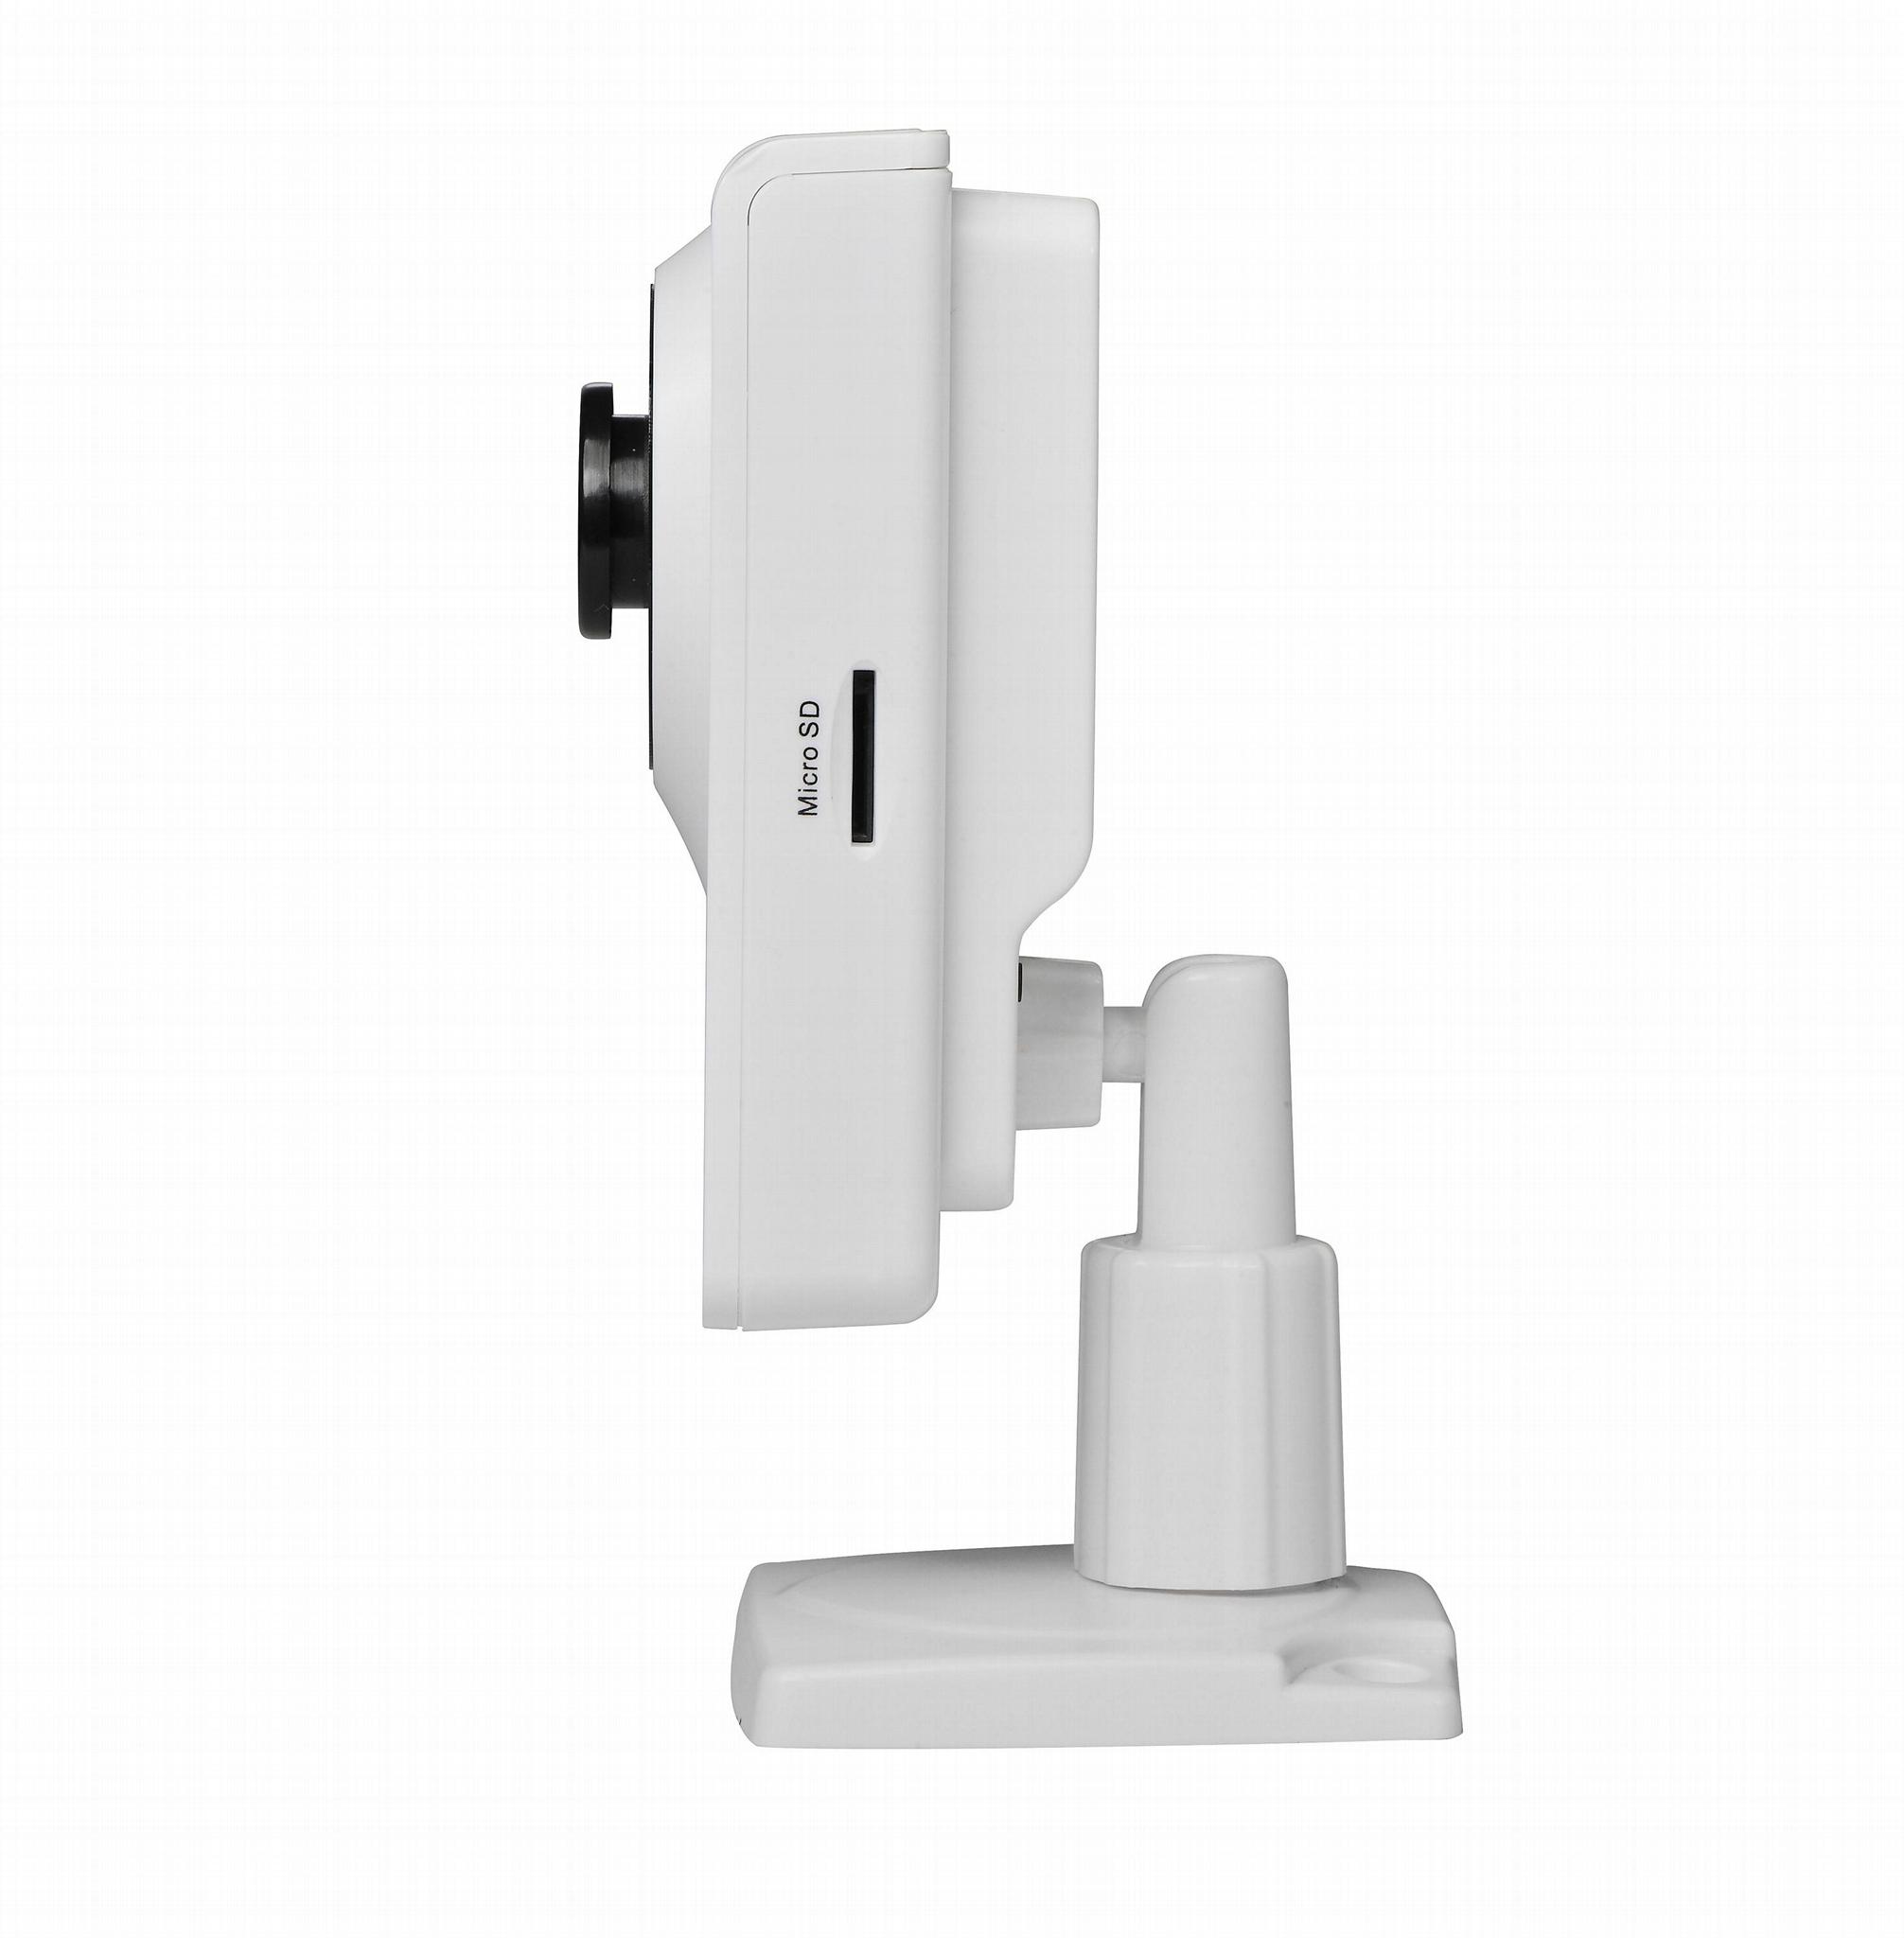 ip camera mini camera baby monitor wifi camera 3